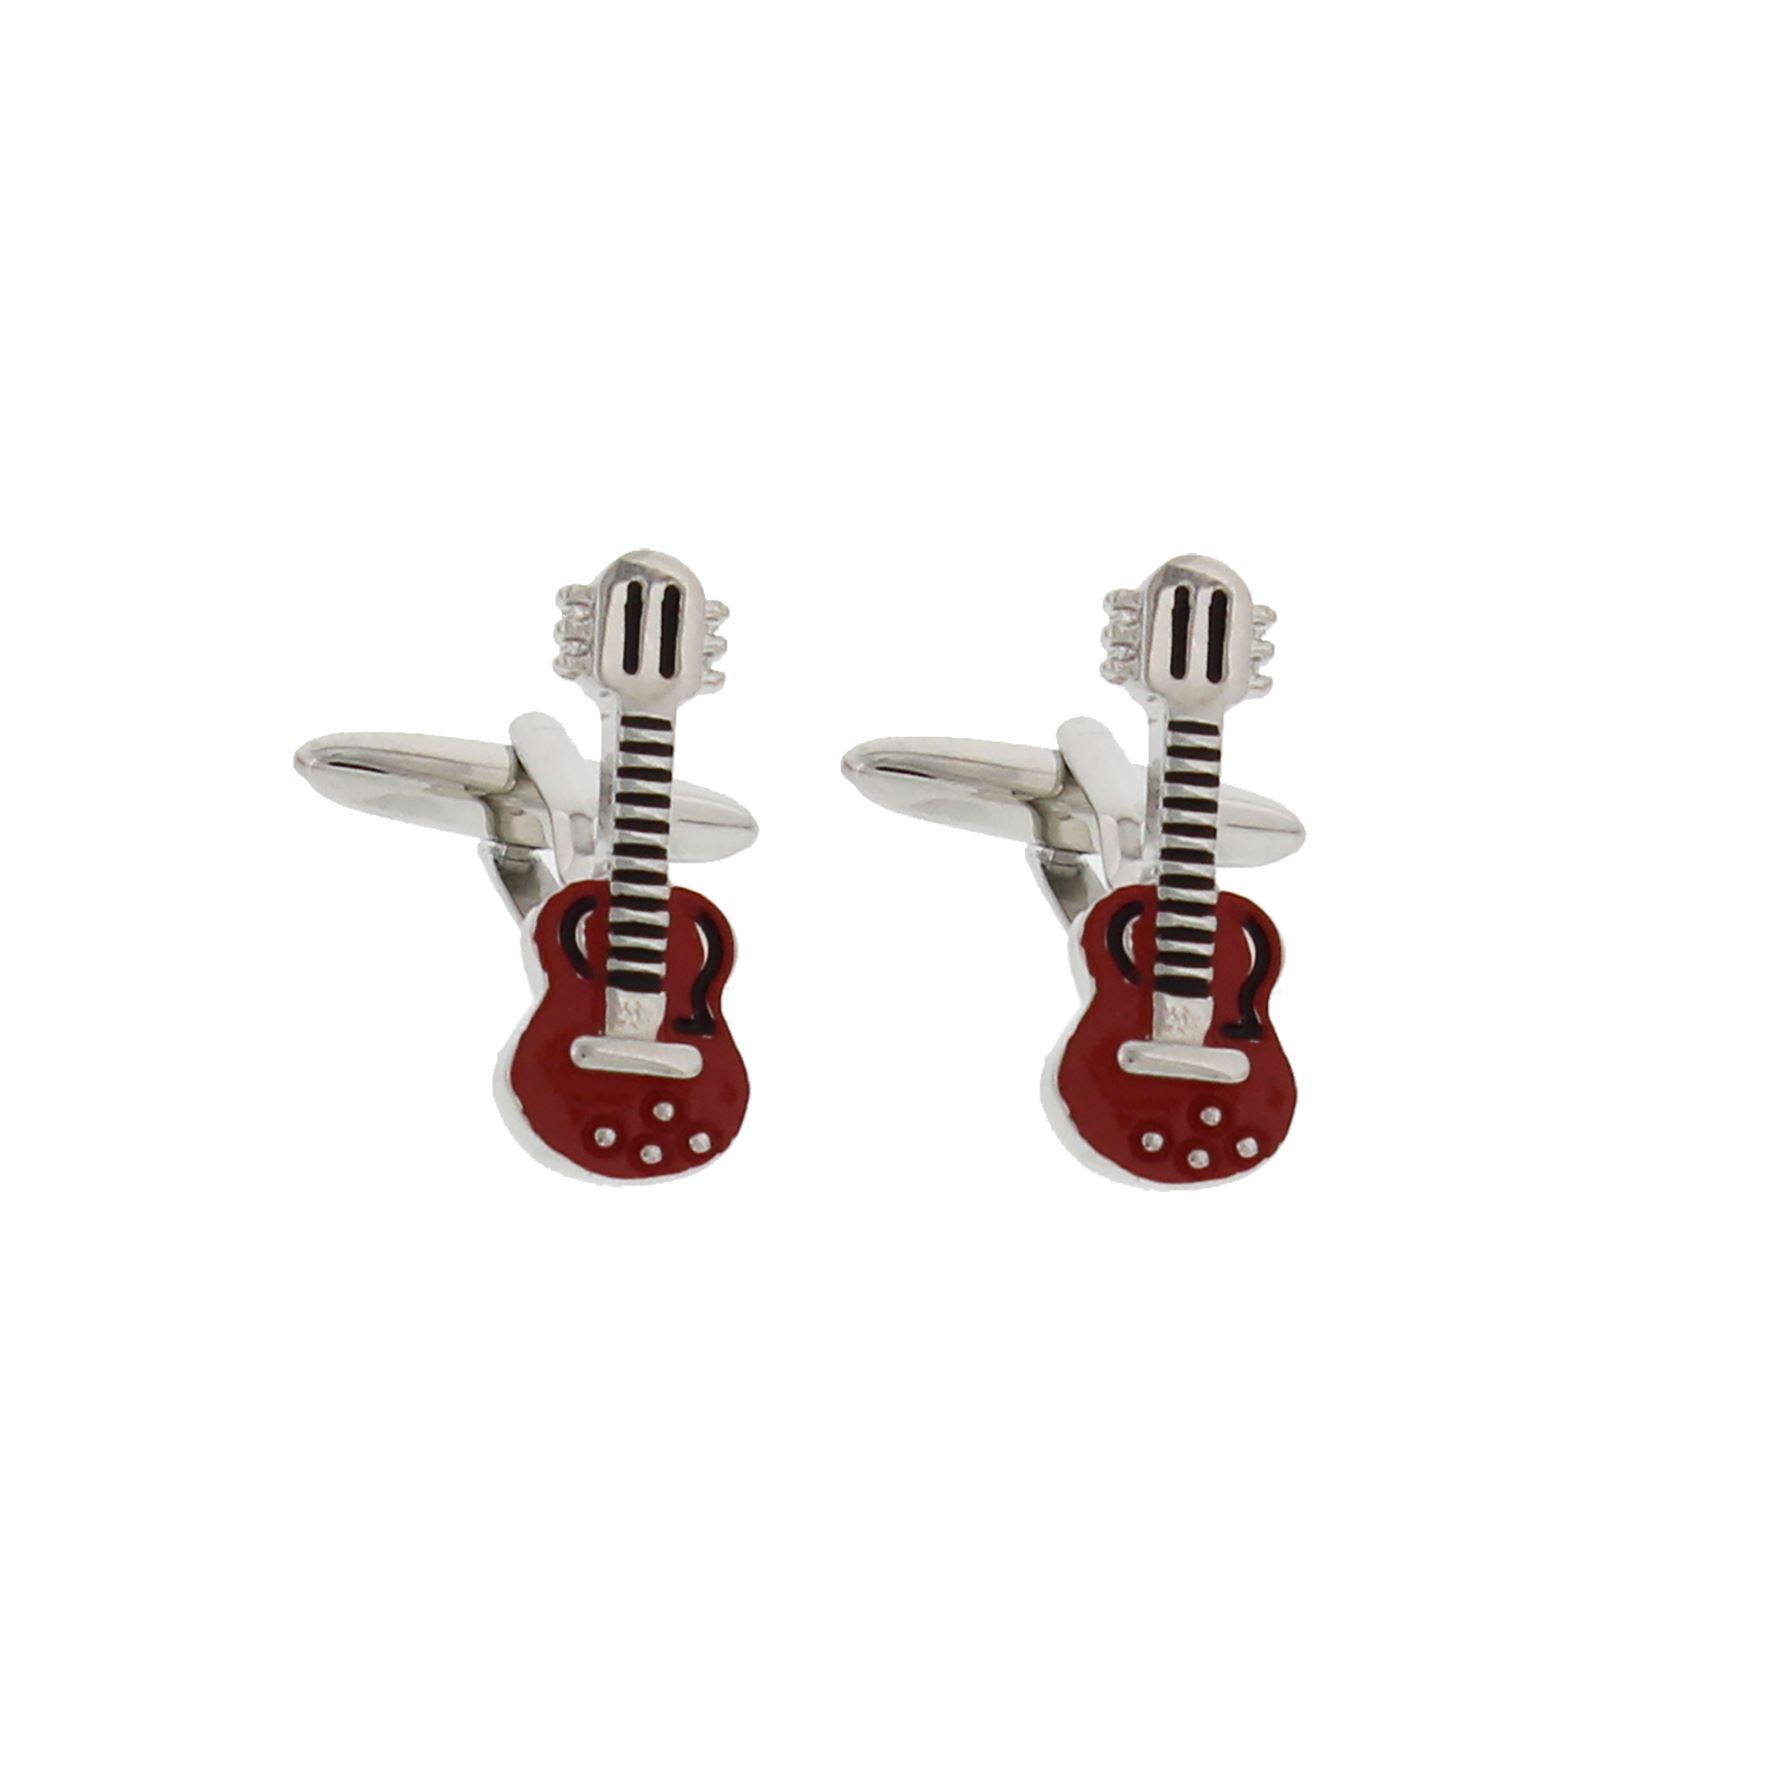 Musicology Rodium Plated & Red Expoxy Cufflinks Guitar